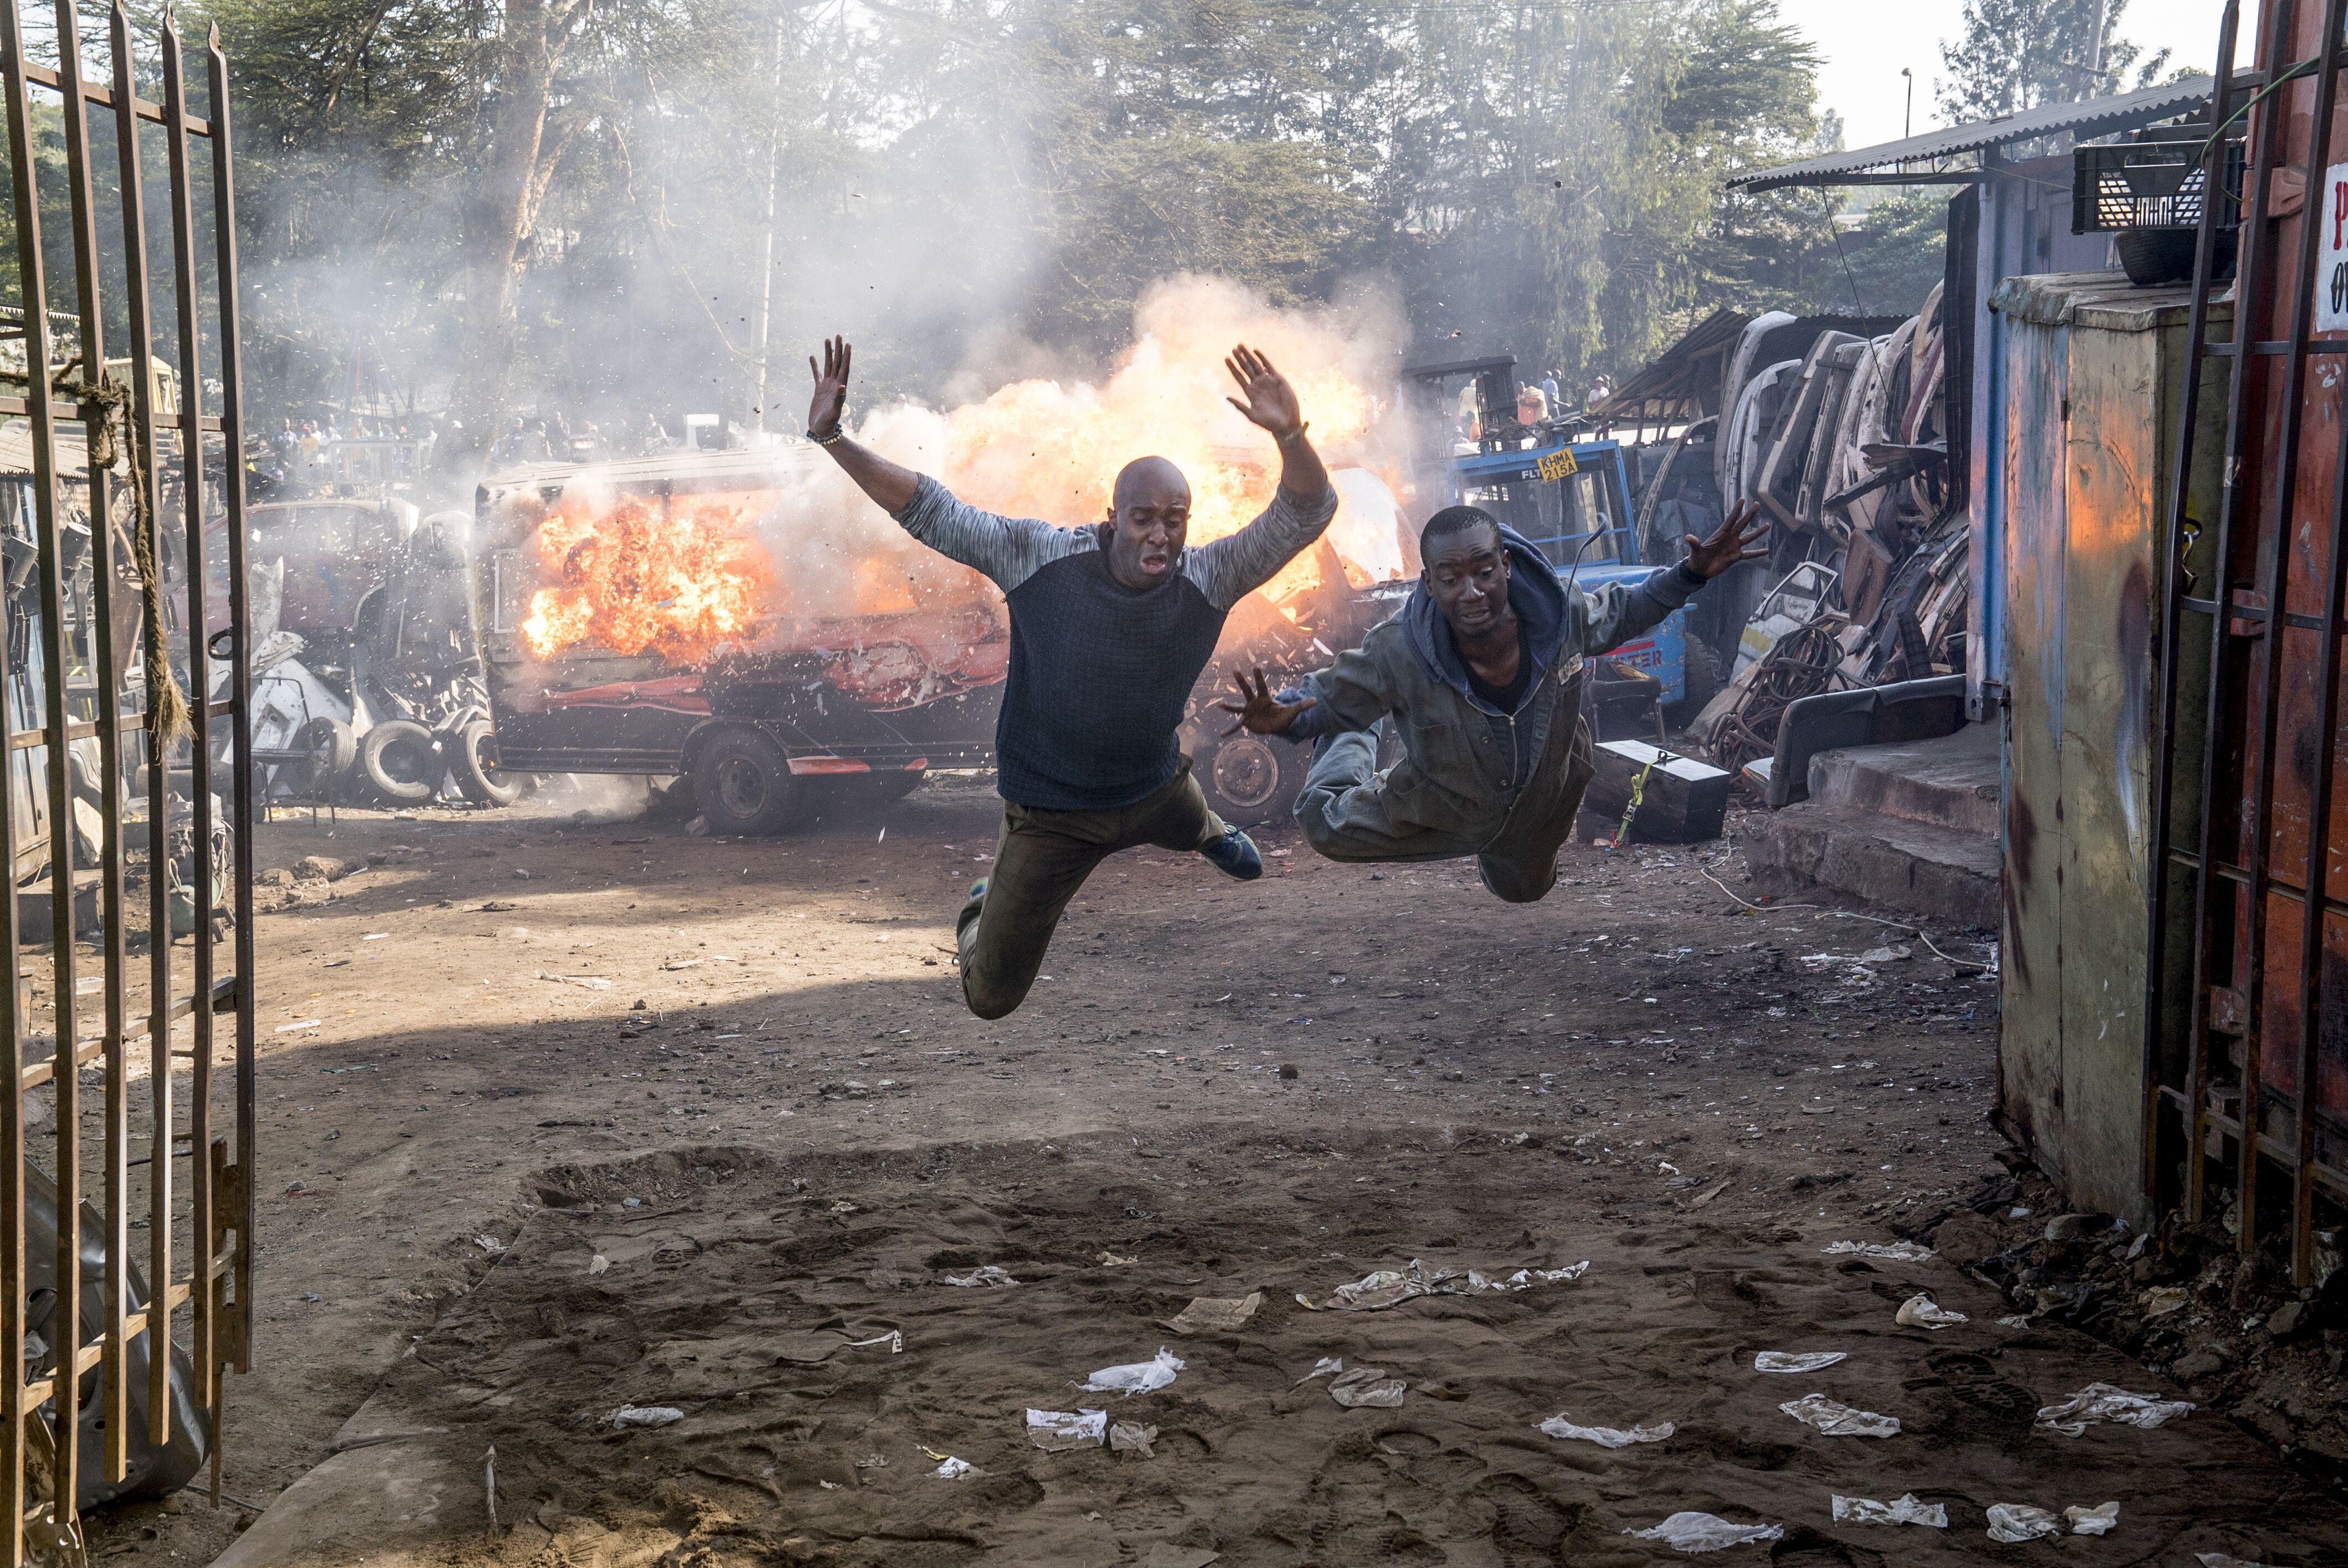 Sense8 recap – season 2, episode 1: Happy F*cking New Year